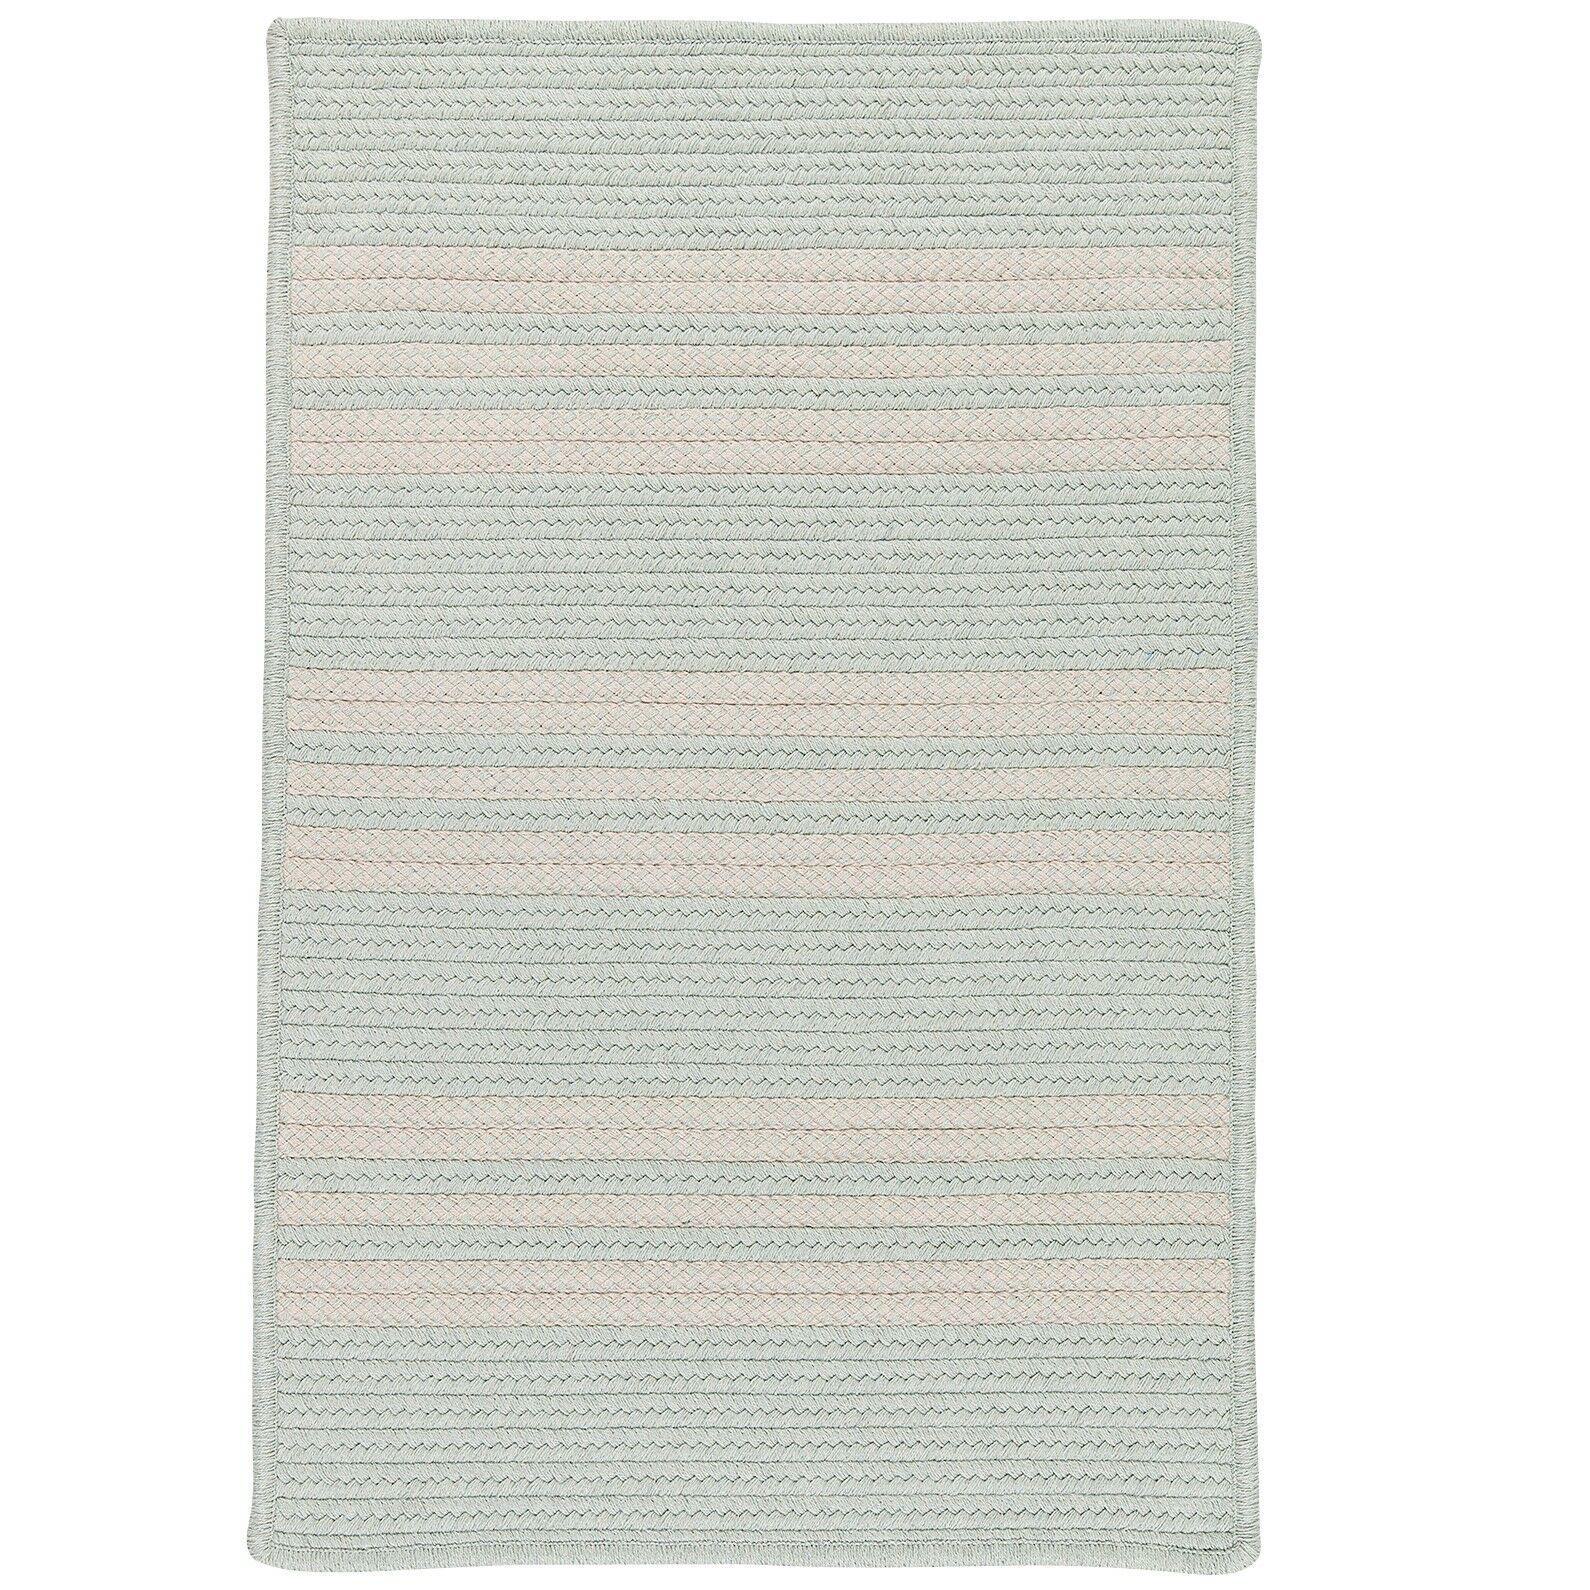 Neponset Hand-Woven Green Indoor/Outdoor Area Rug Rug Size: 5' x 7'